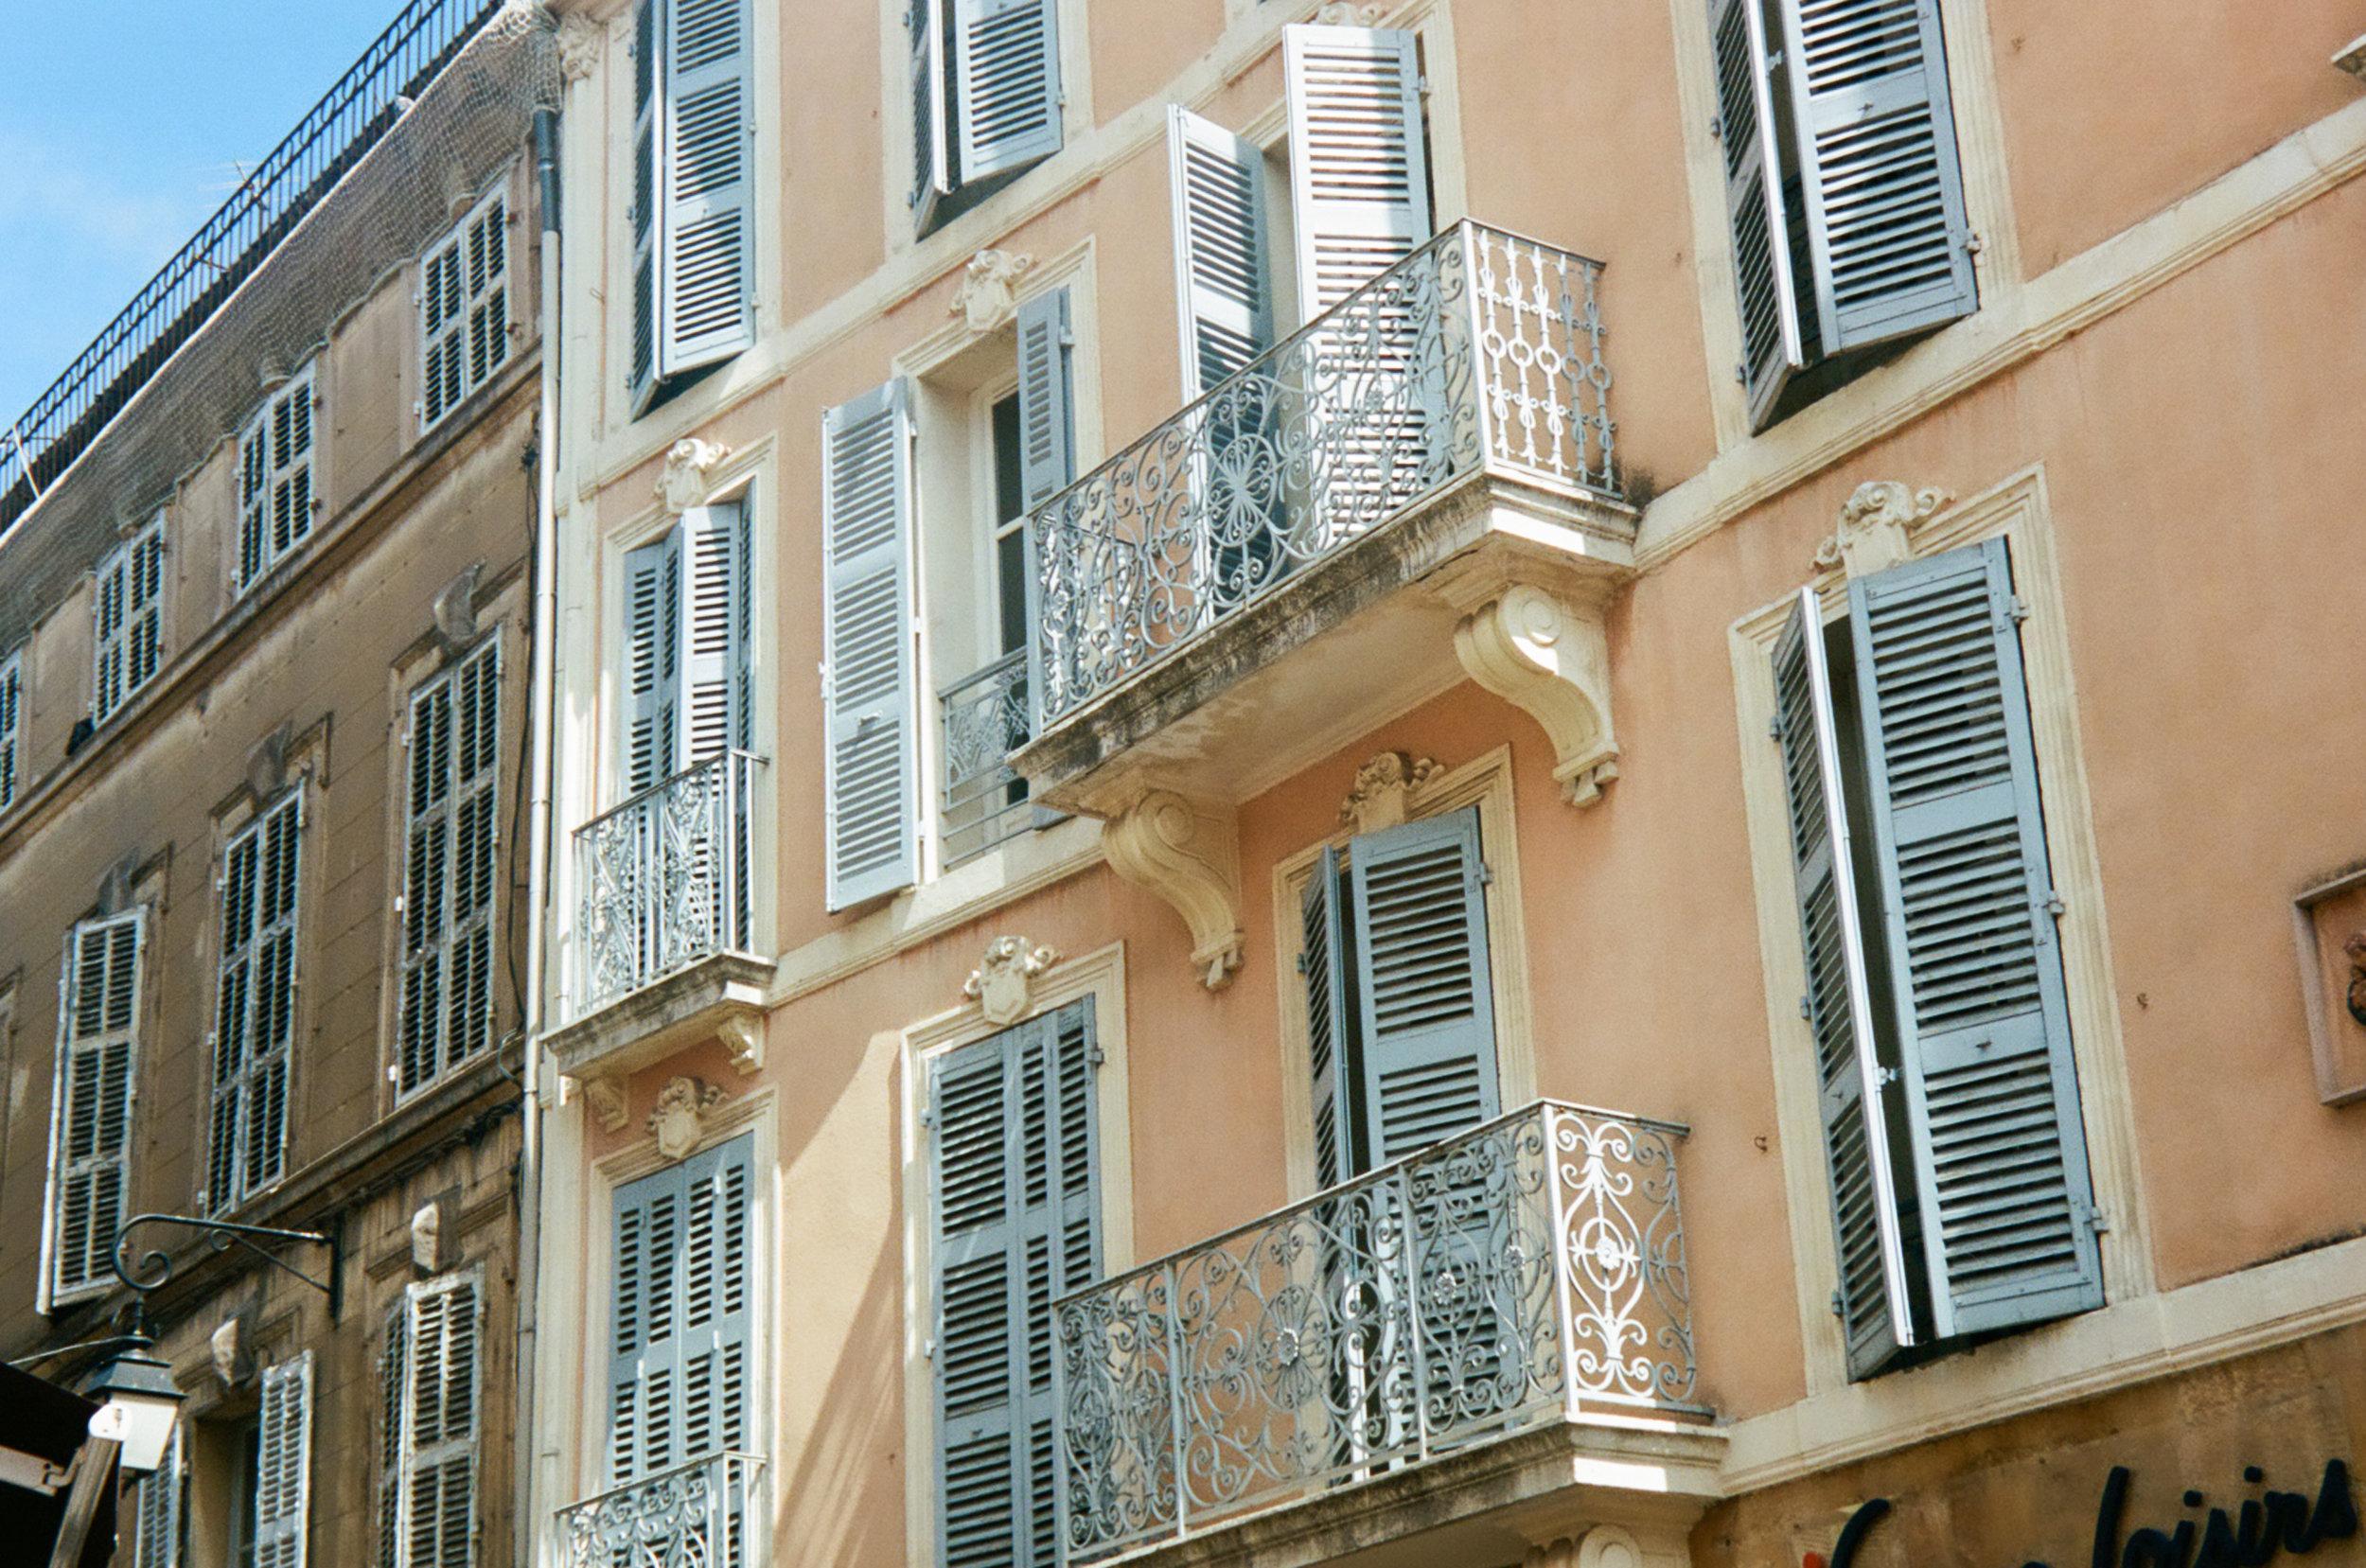 Carin_Olsson_Provence_07.jpg